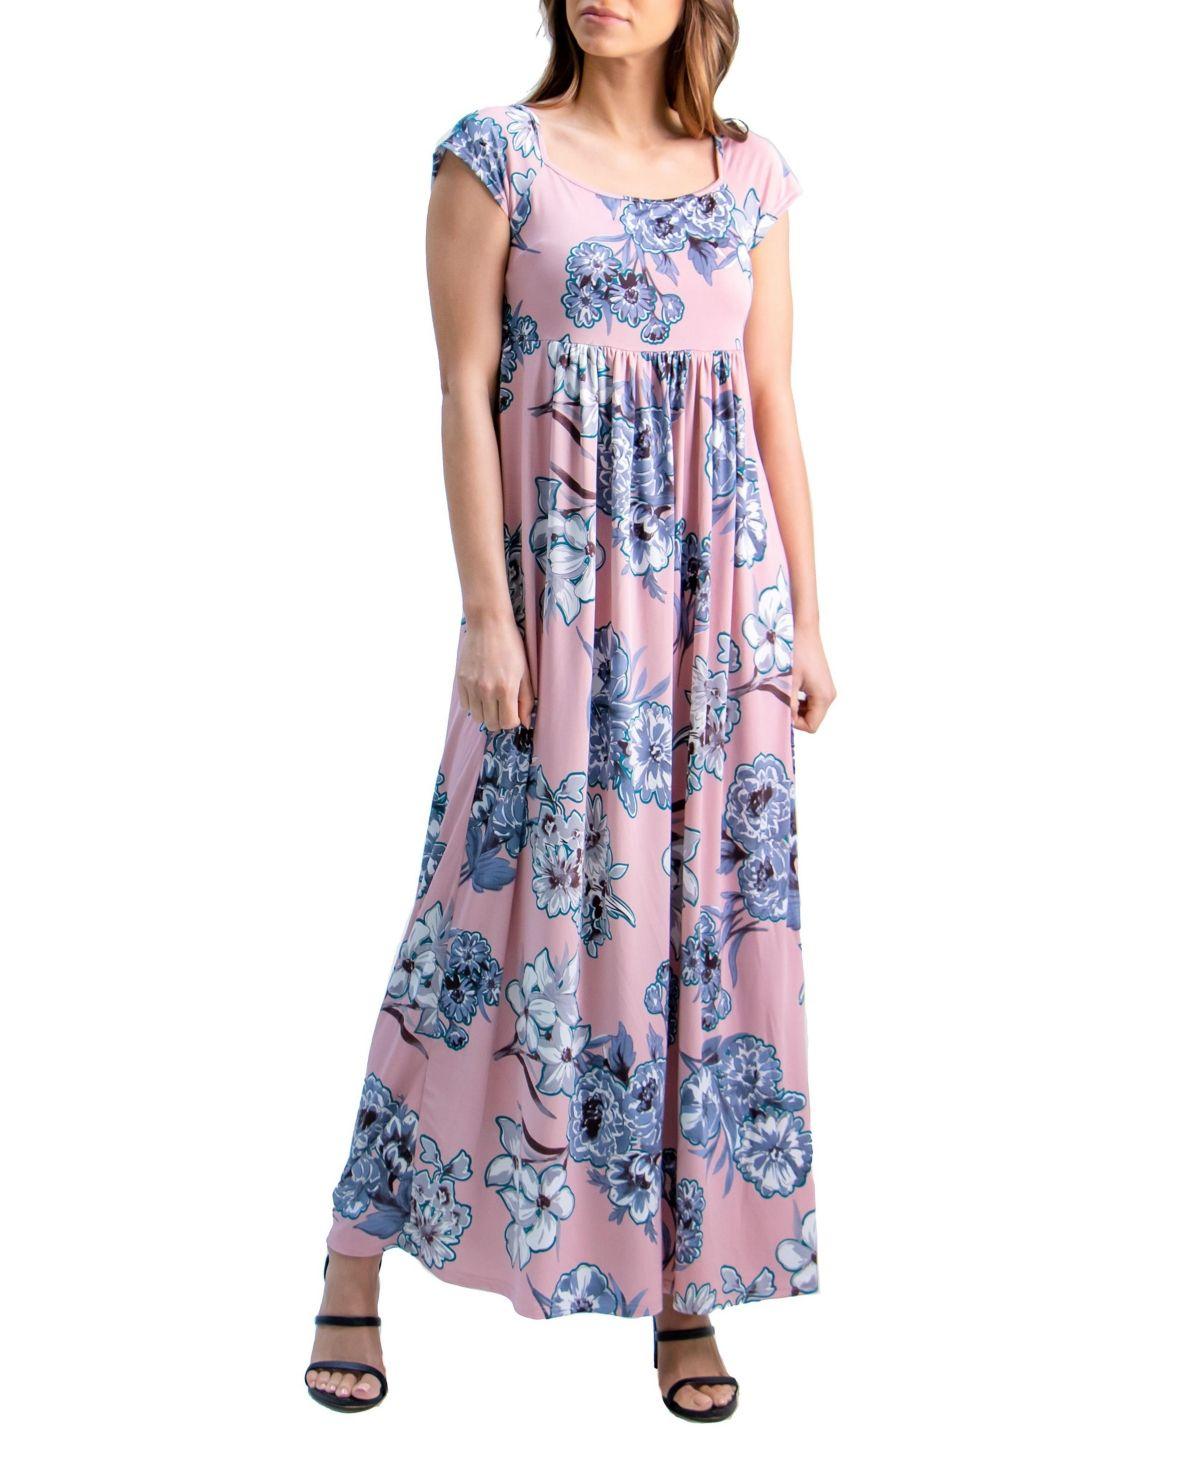 25+ Empire waist maxi dress ideas in 2021